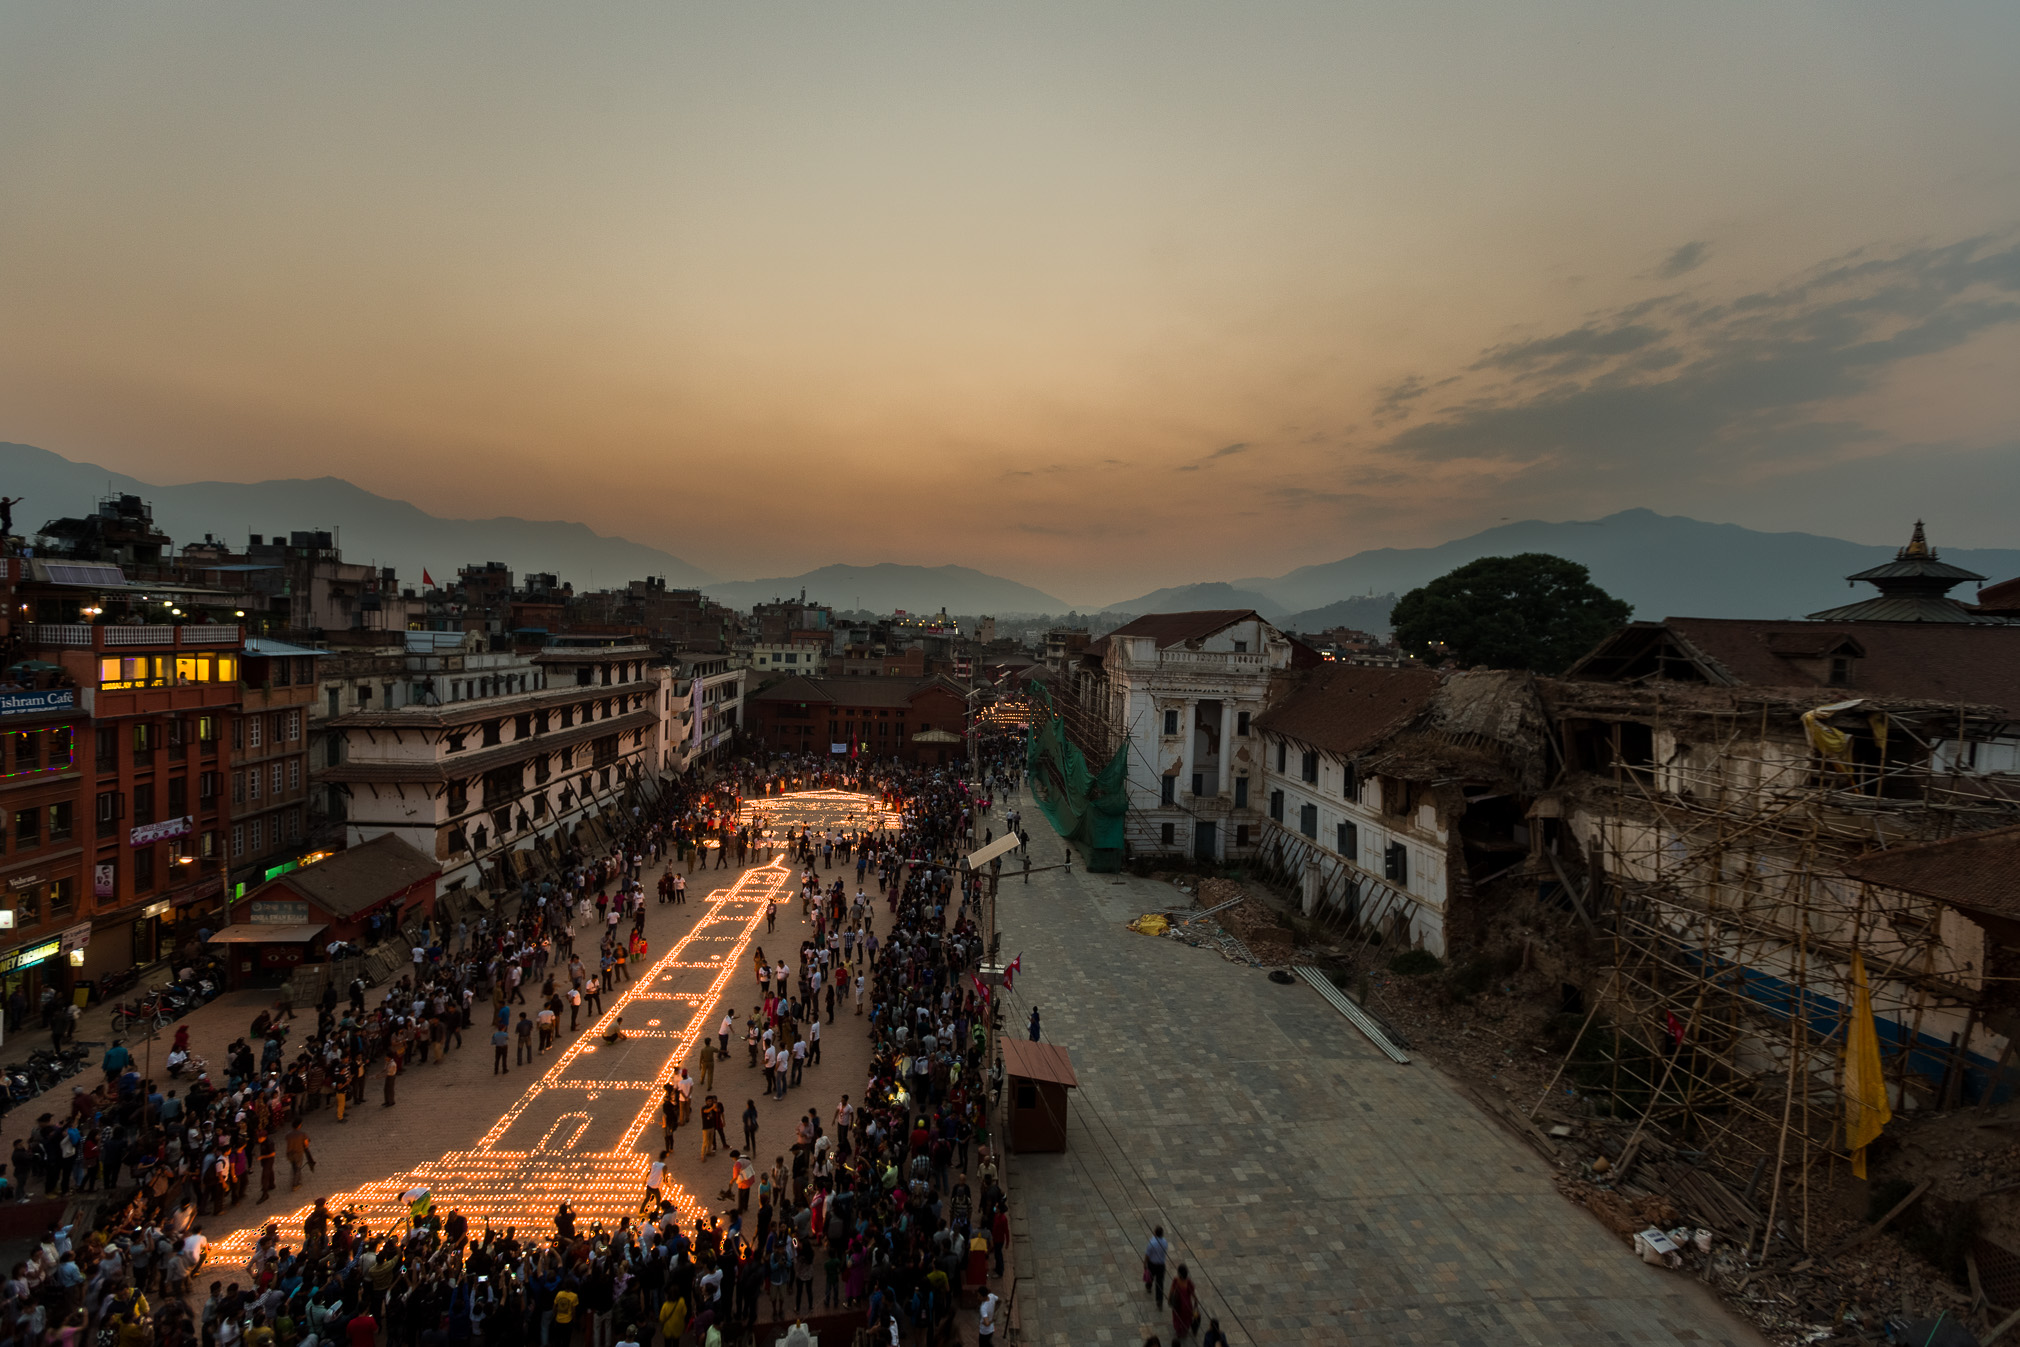 160424-184526-Nepal-Gavin-Gough-4-HDR.jpg